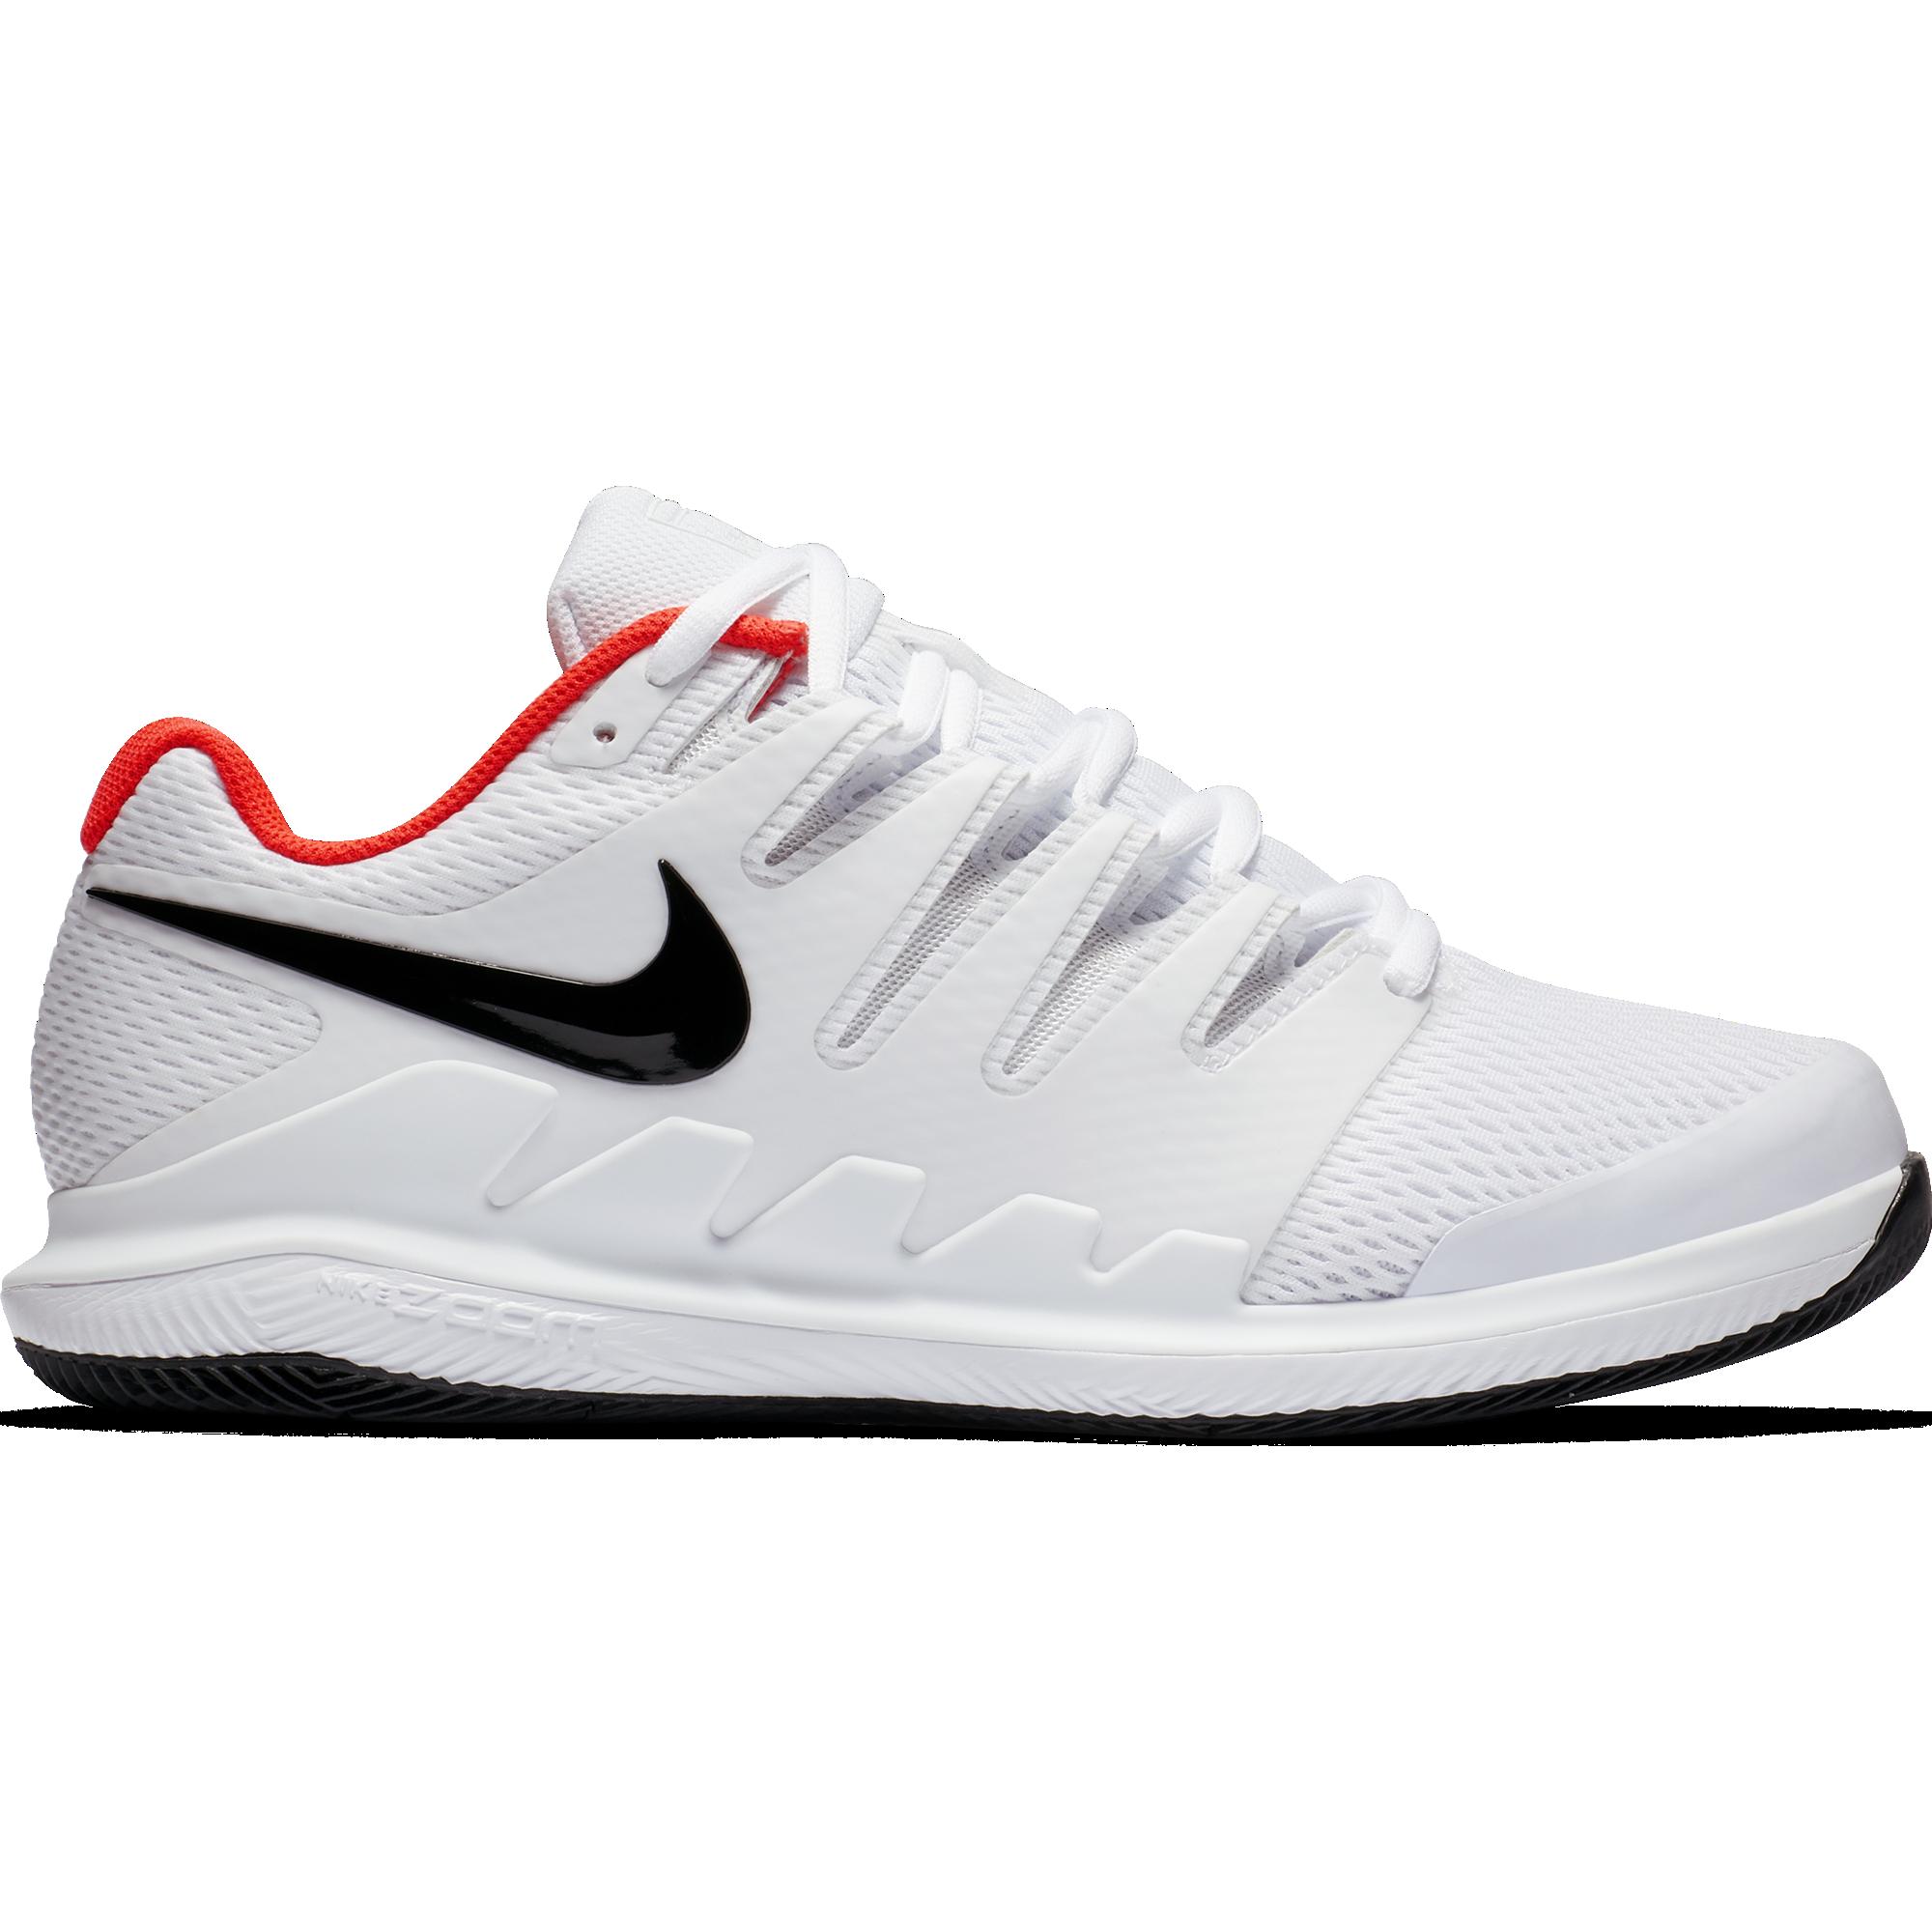 Nike Air Zoom Vapor X Wide Men's Tennis